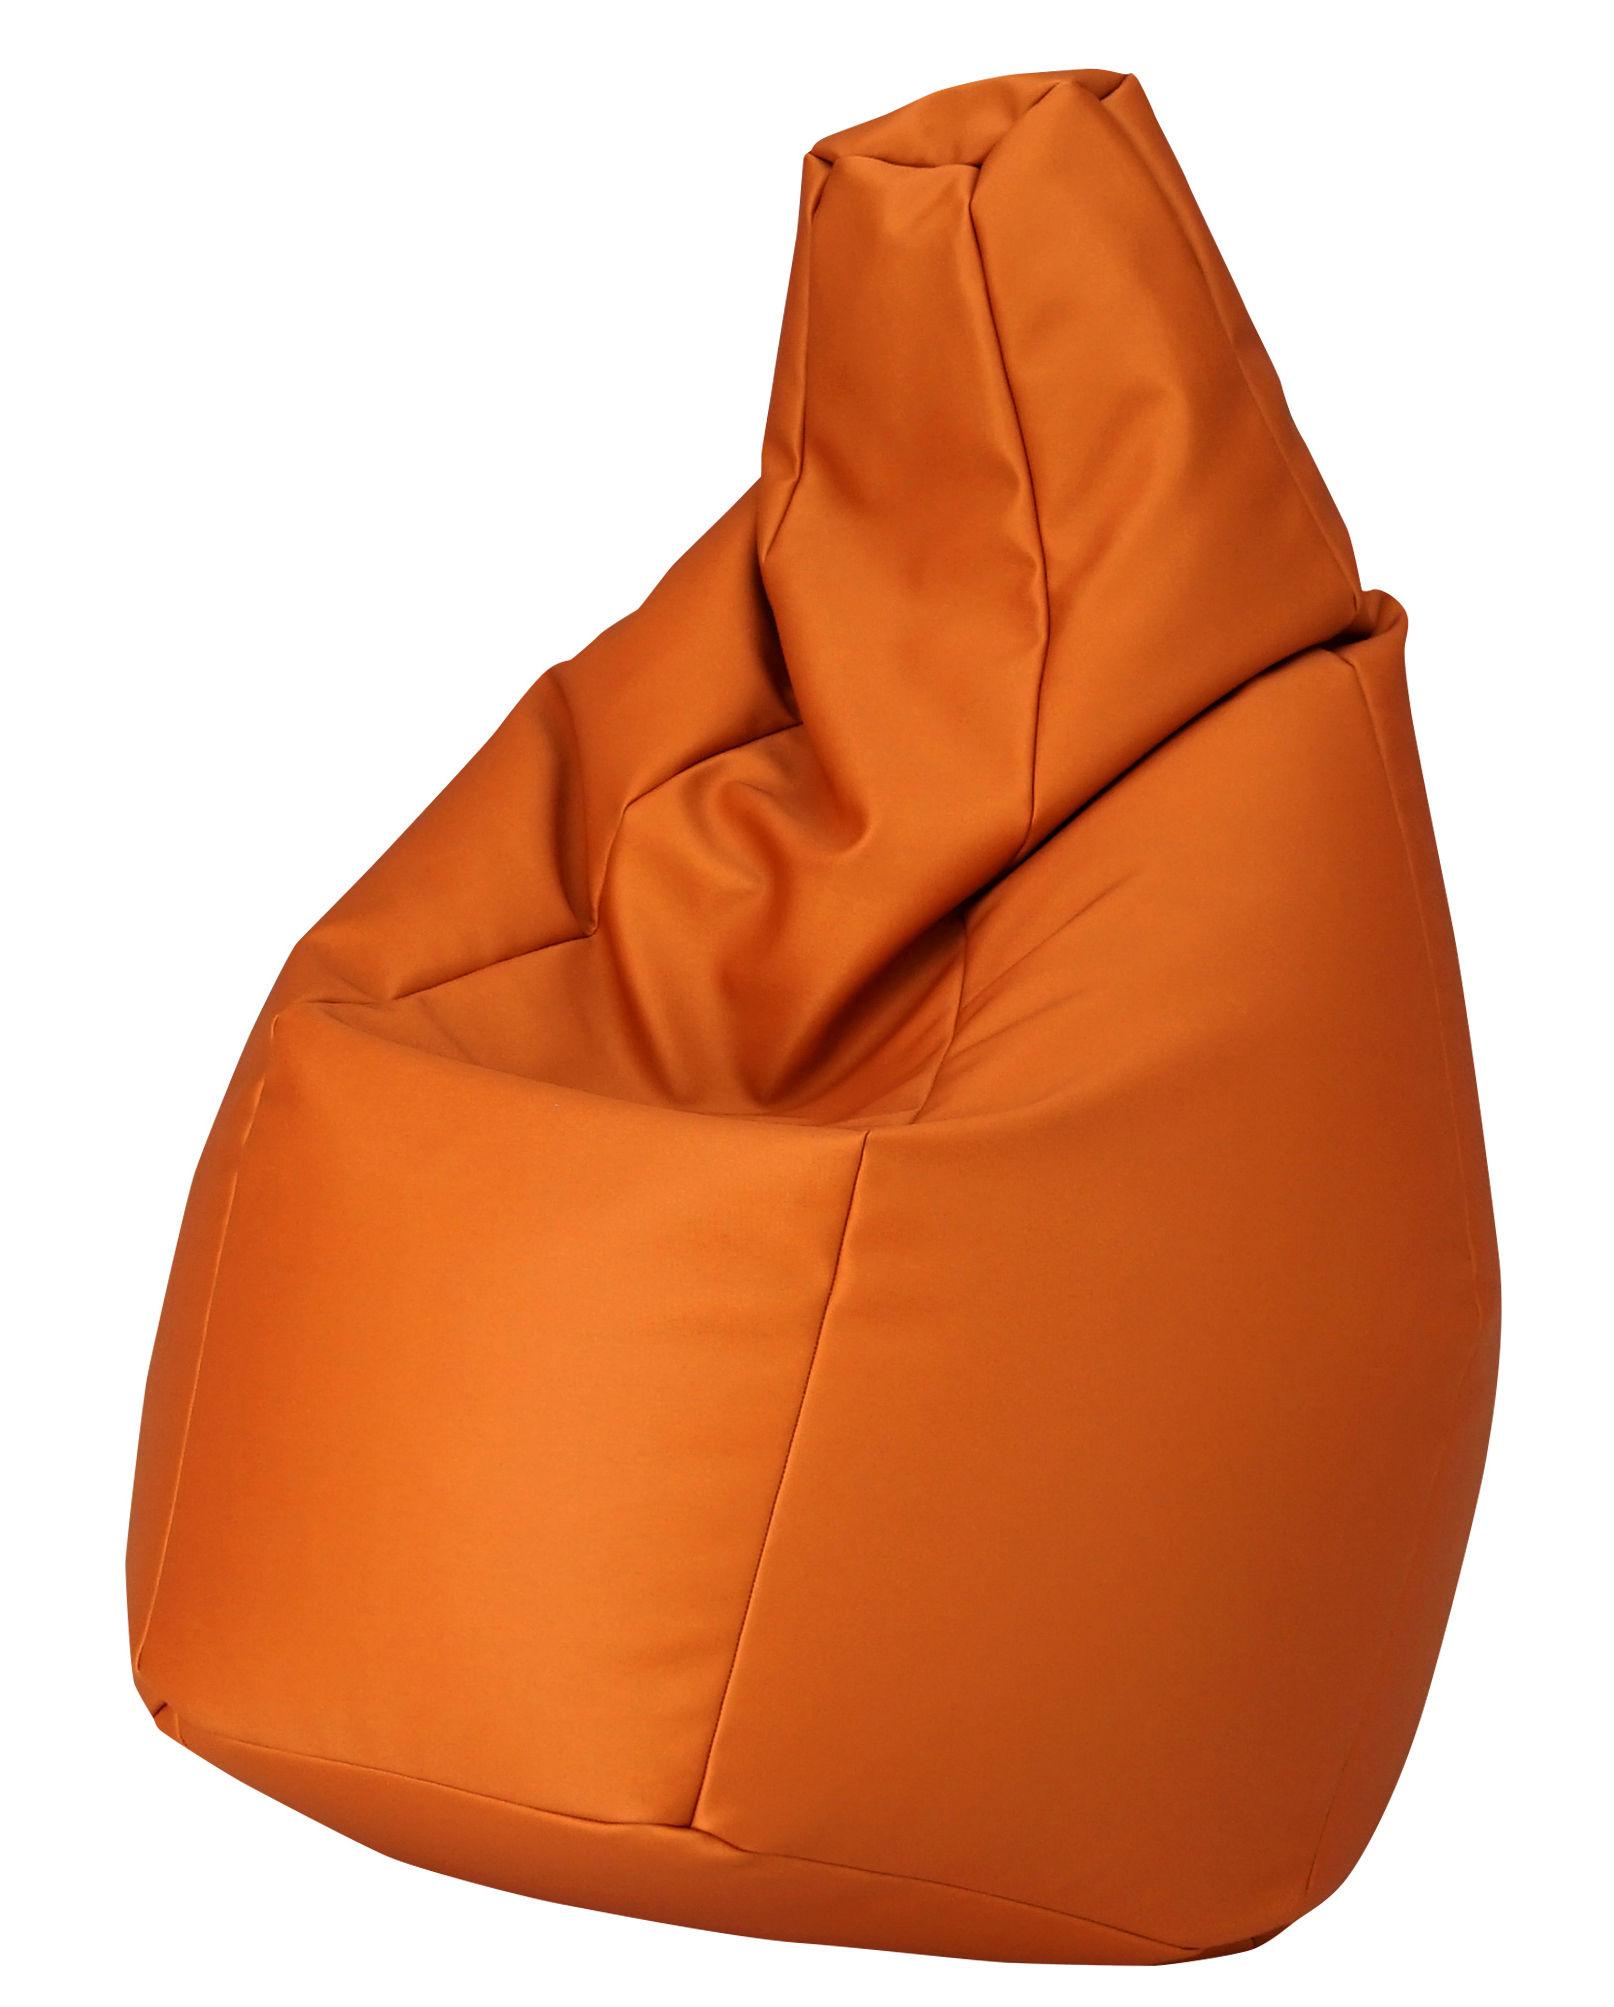 Pouf Zanotta.Sacco Outdoor Pouf Fabric Orange By Zanotta Made In Design Uk